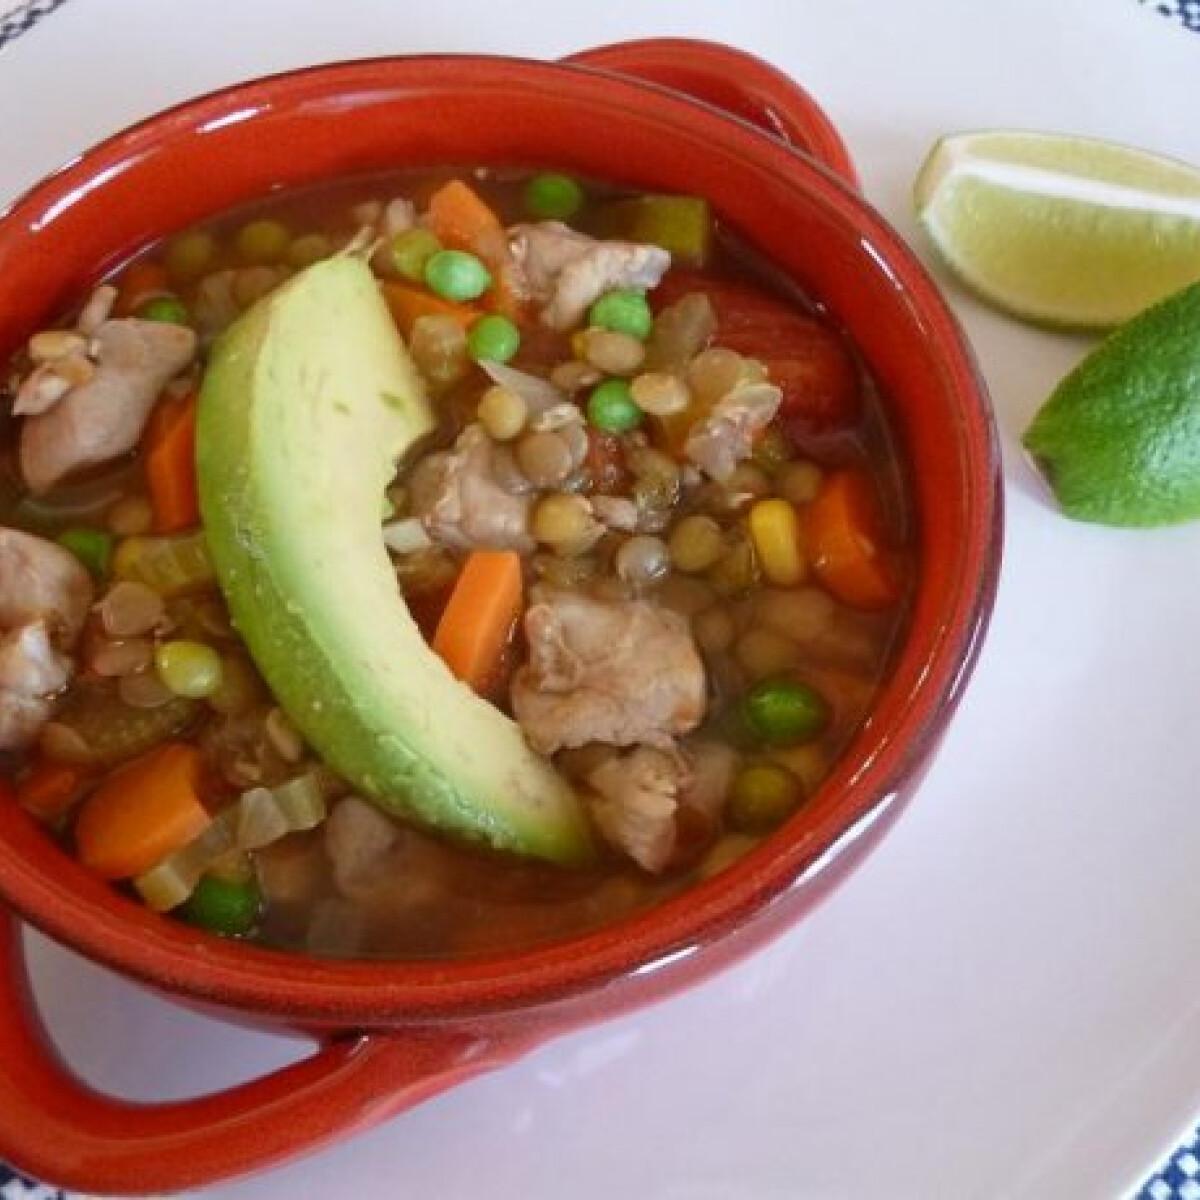 Ezen a képen: Csirkecomb leves